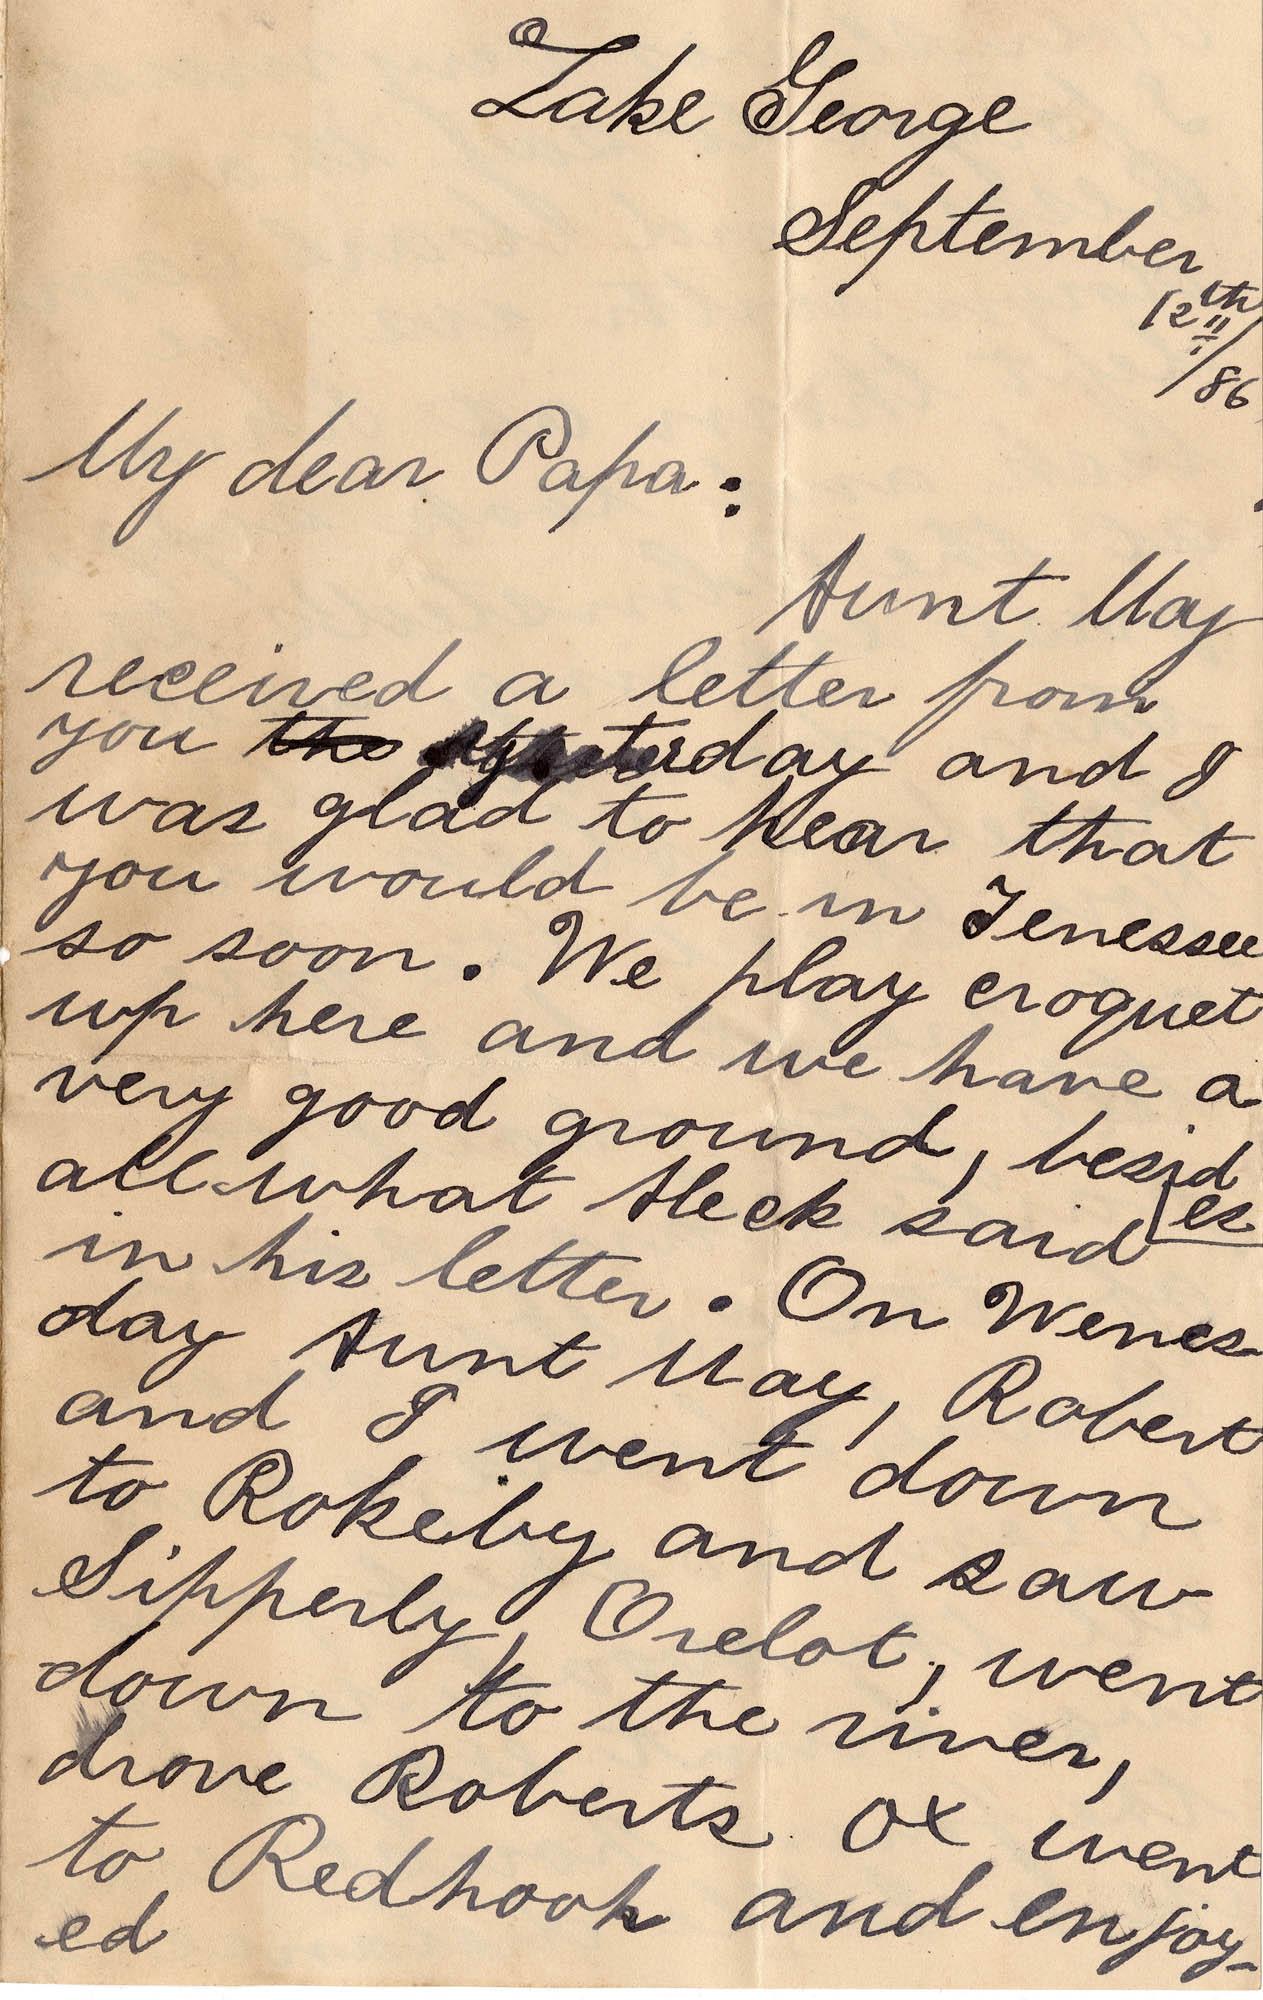 151. Trapier [Marshall?] to Alex Marshall? -- Sept. 12, 1886